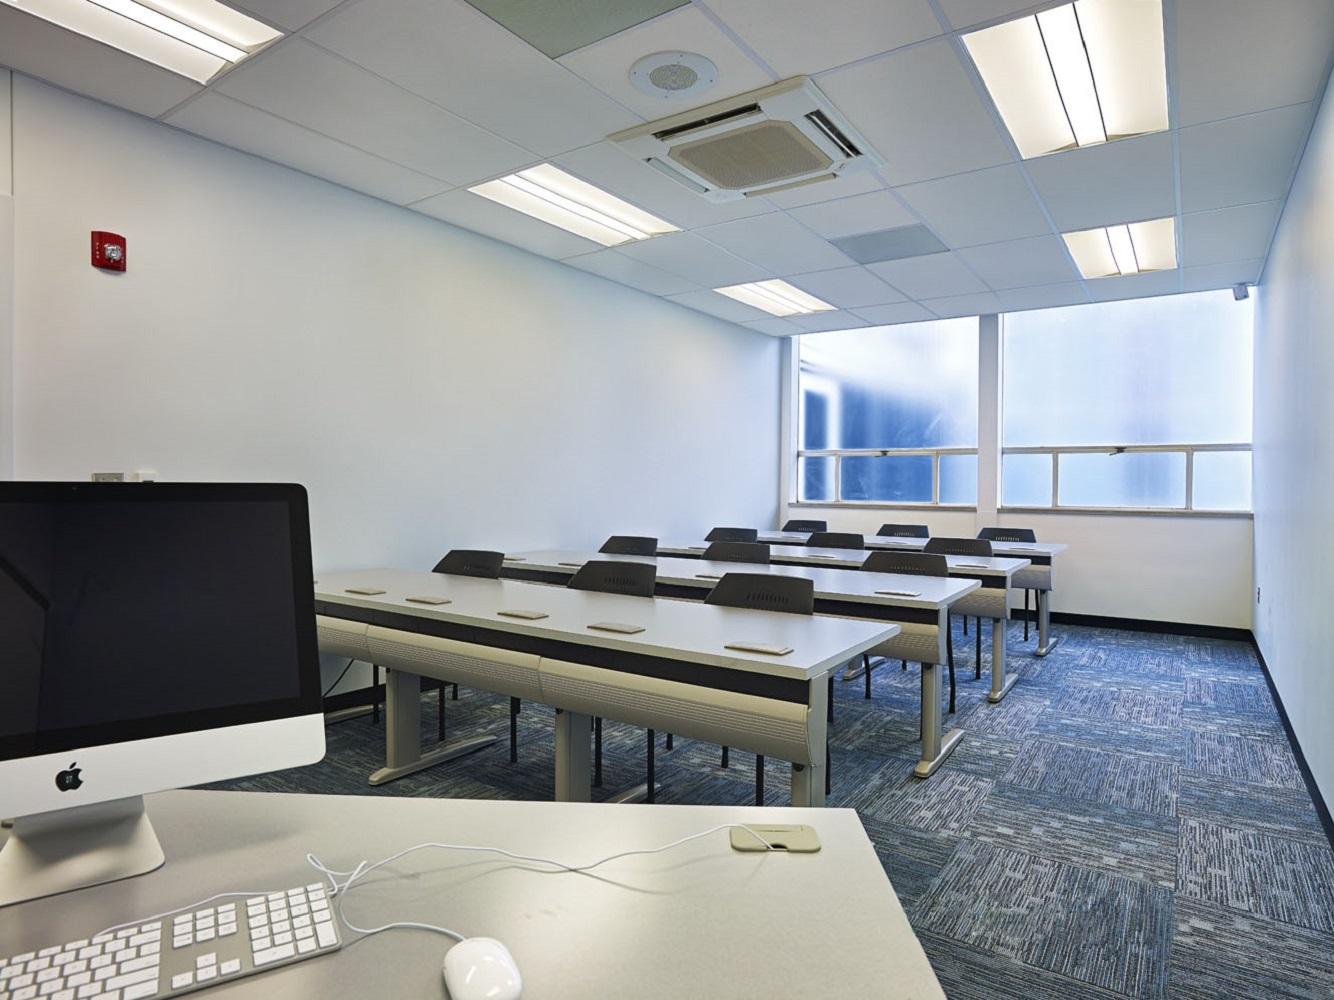 Interior - Classroom.jpg